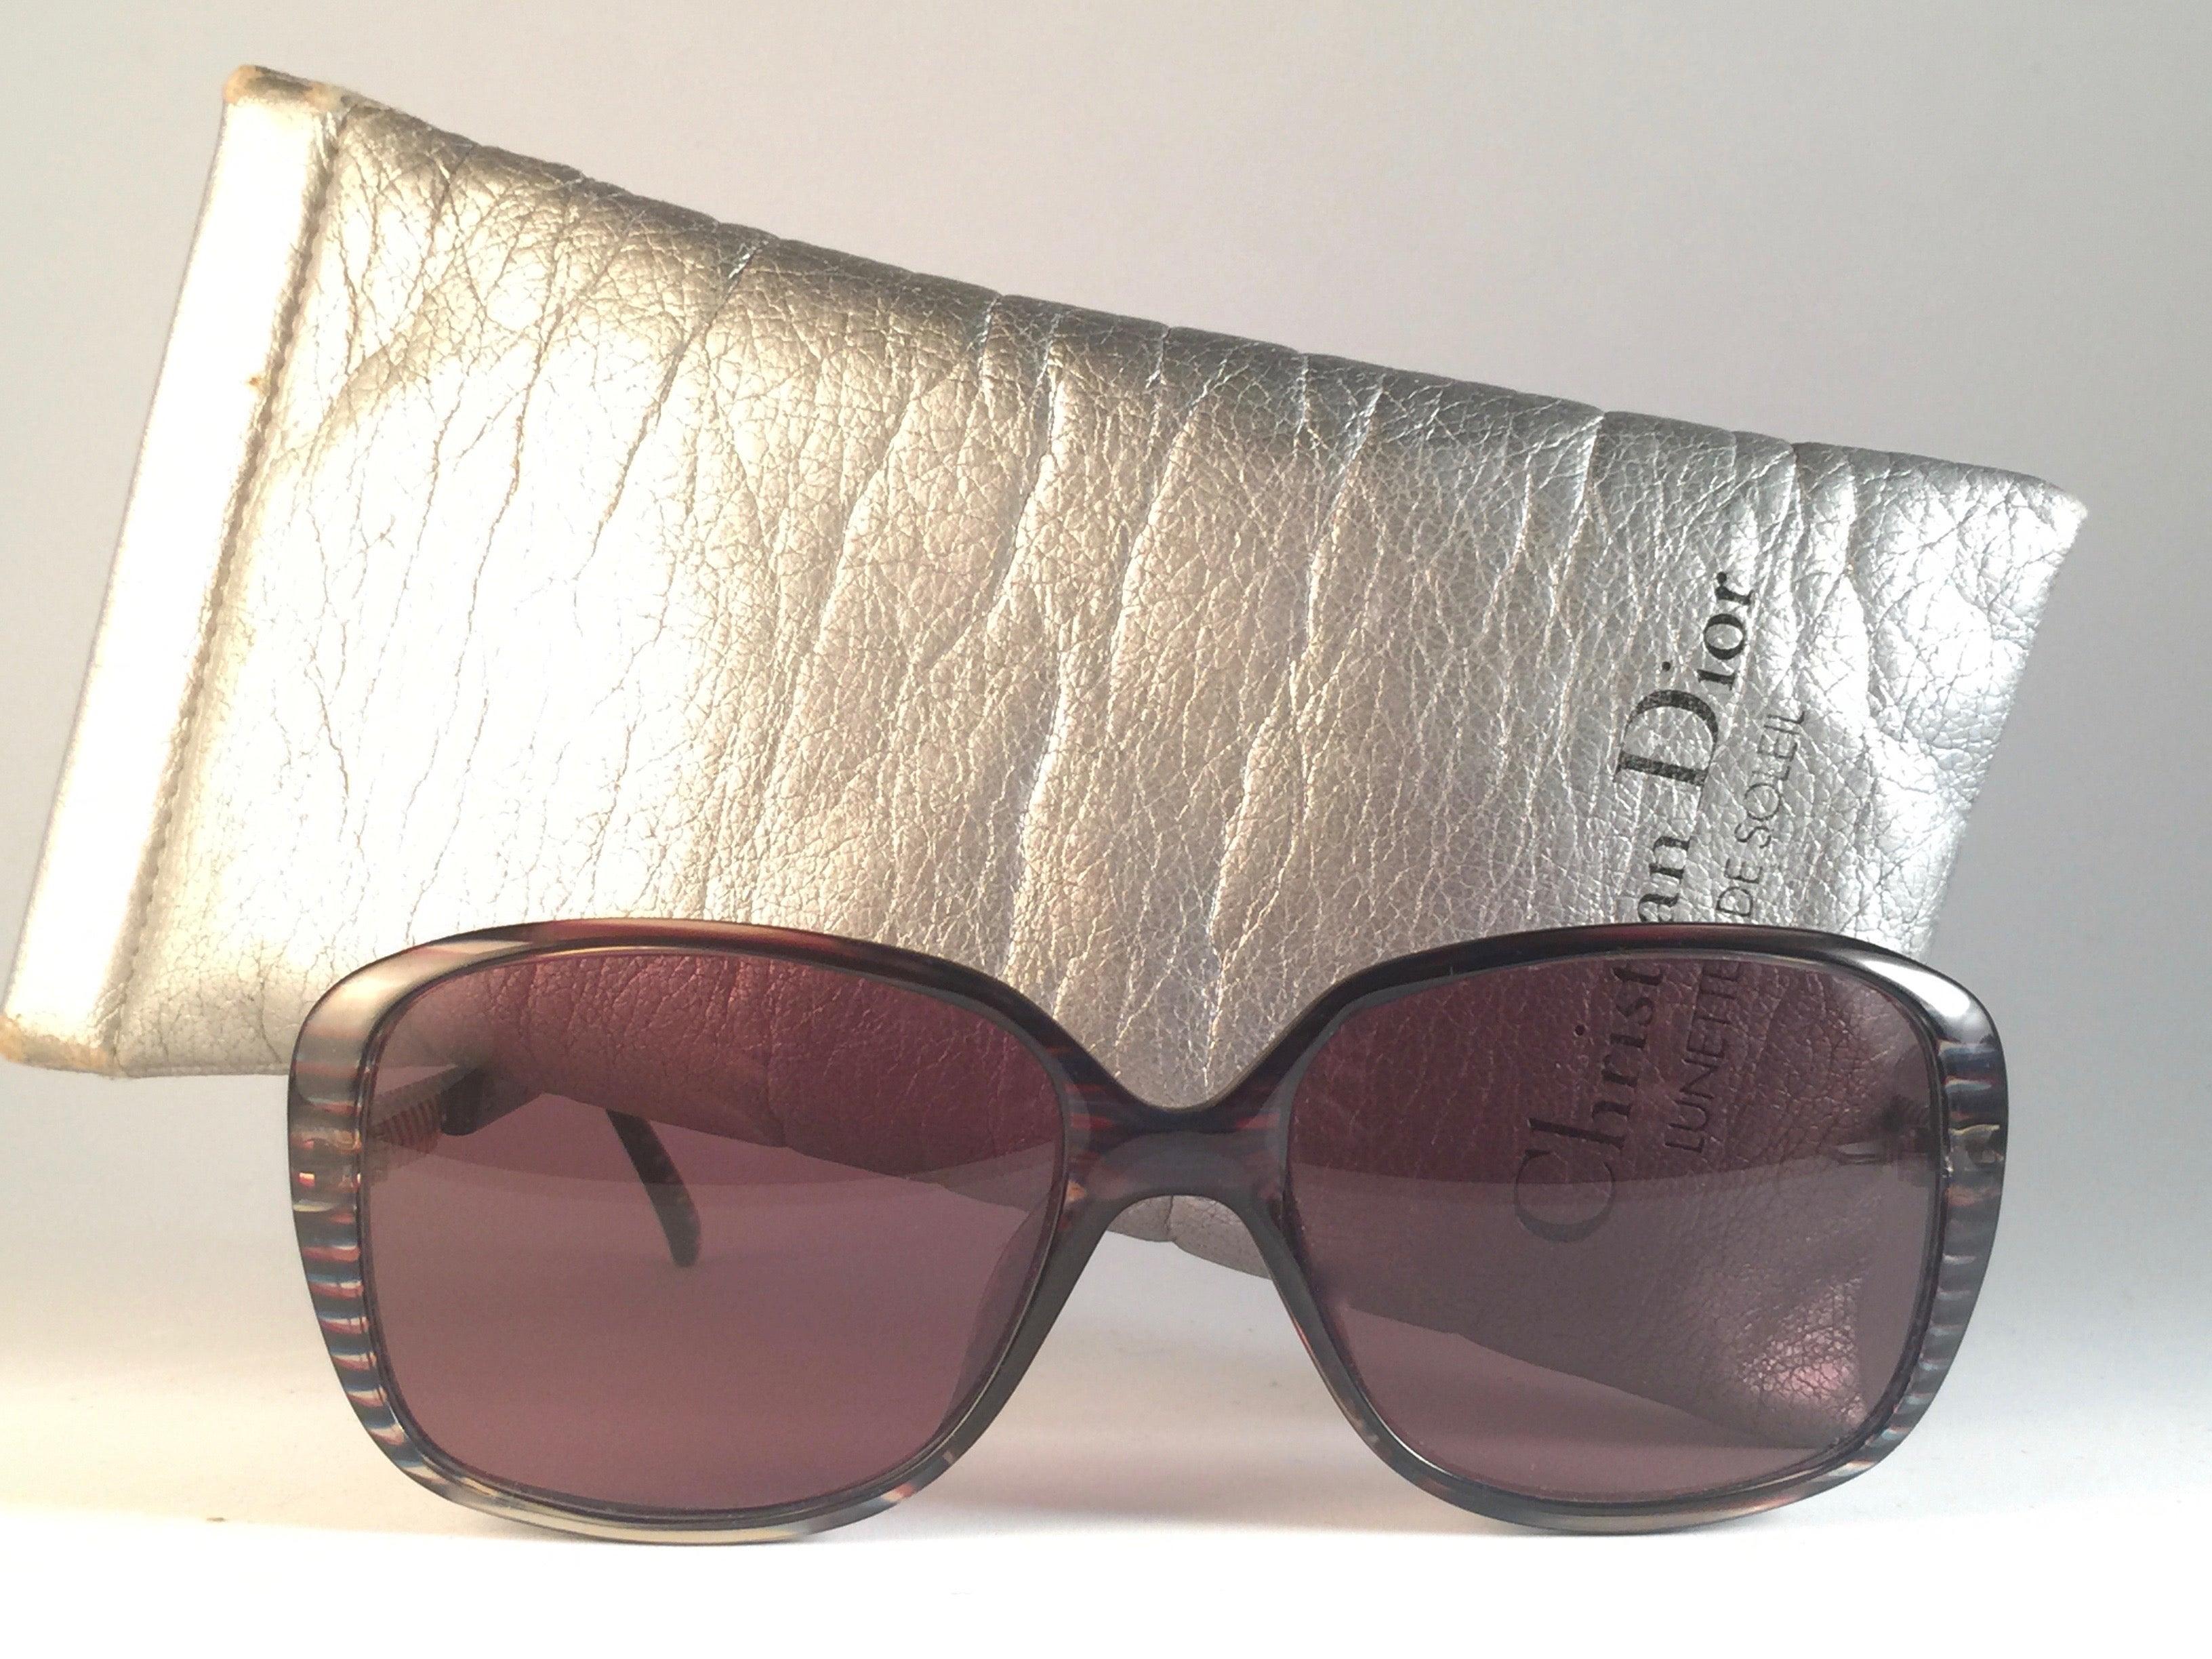 f5ecffa8a56d New Vintage Christian Dior 2415 Stripes Gold Sunglasses 1980 Austria For  Sale at 1stdibs